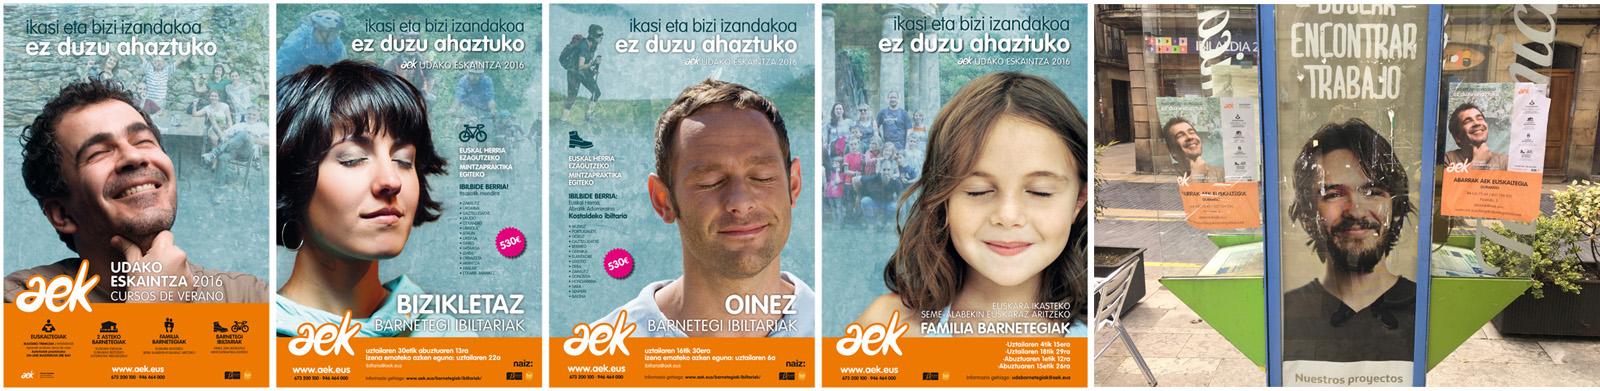 AEK-Telefónica-Publizitatea-Kalea-iStock-Getty Images